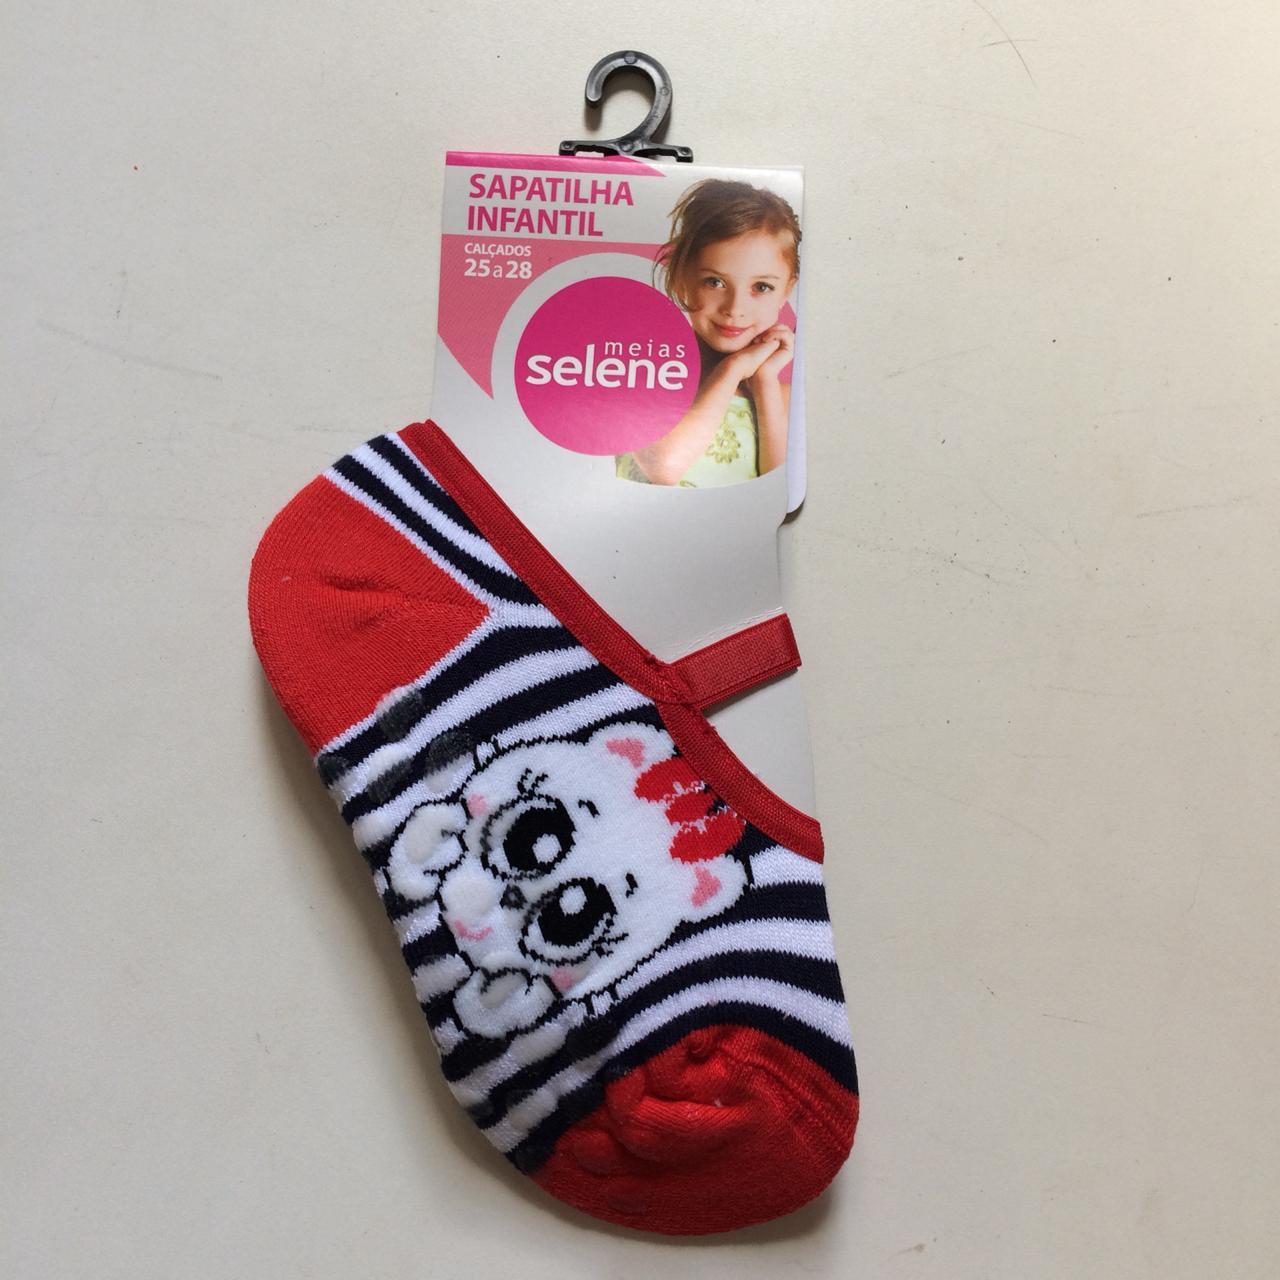 Meia Sapatilha Infantil Vermelha Com Antiderrapante Selene